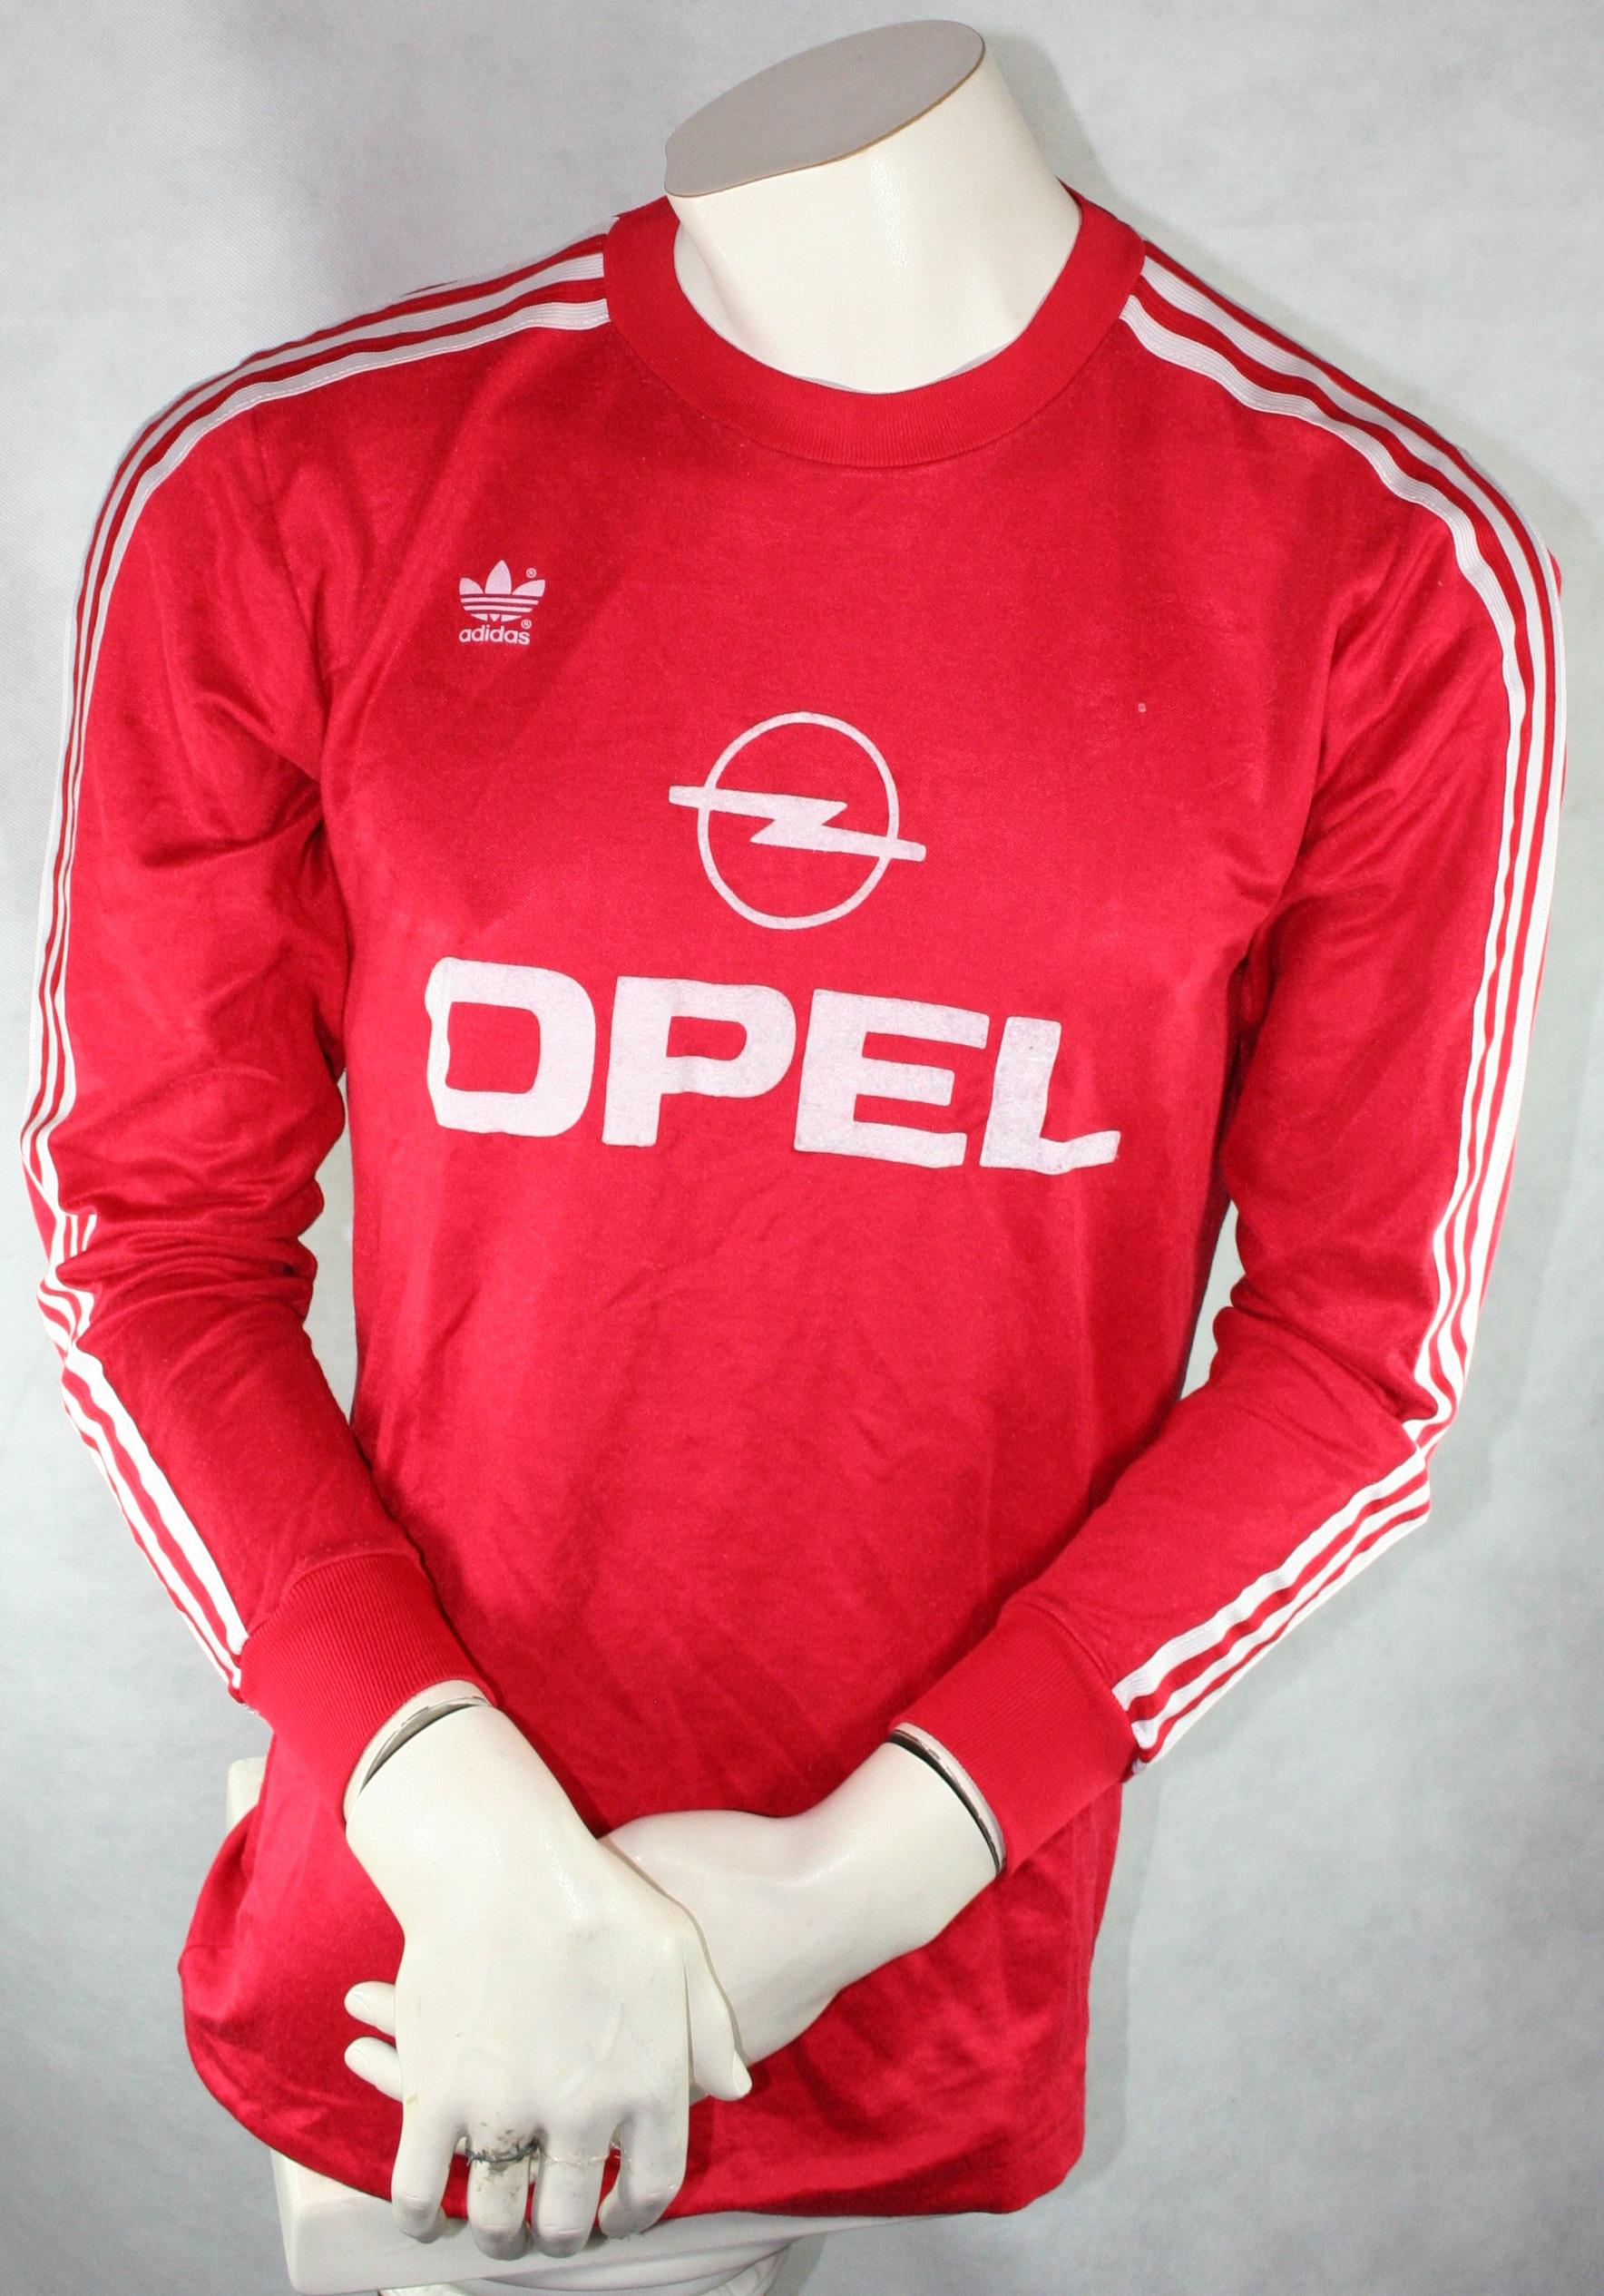 636efacbd53b50 Adidas FC Bayern München Trikot 10 Thon Laudrup 1989 91 Rot Heim Opel  Herren L